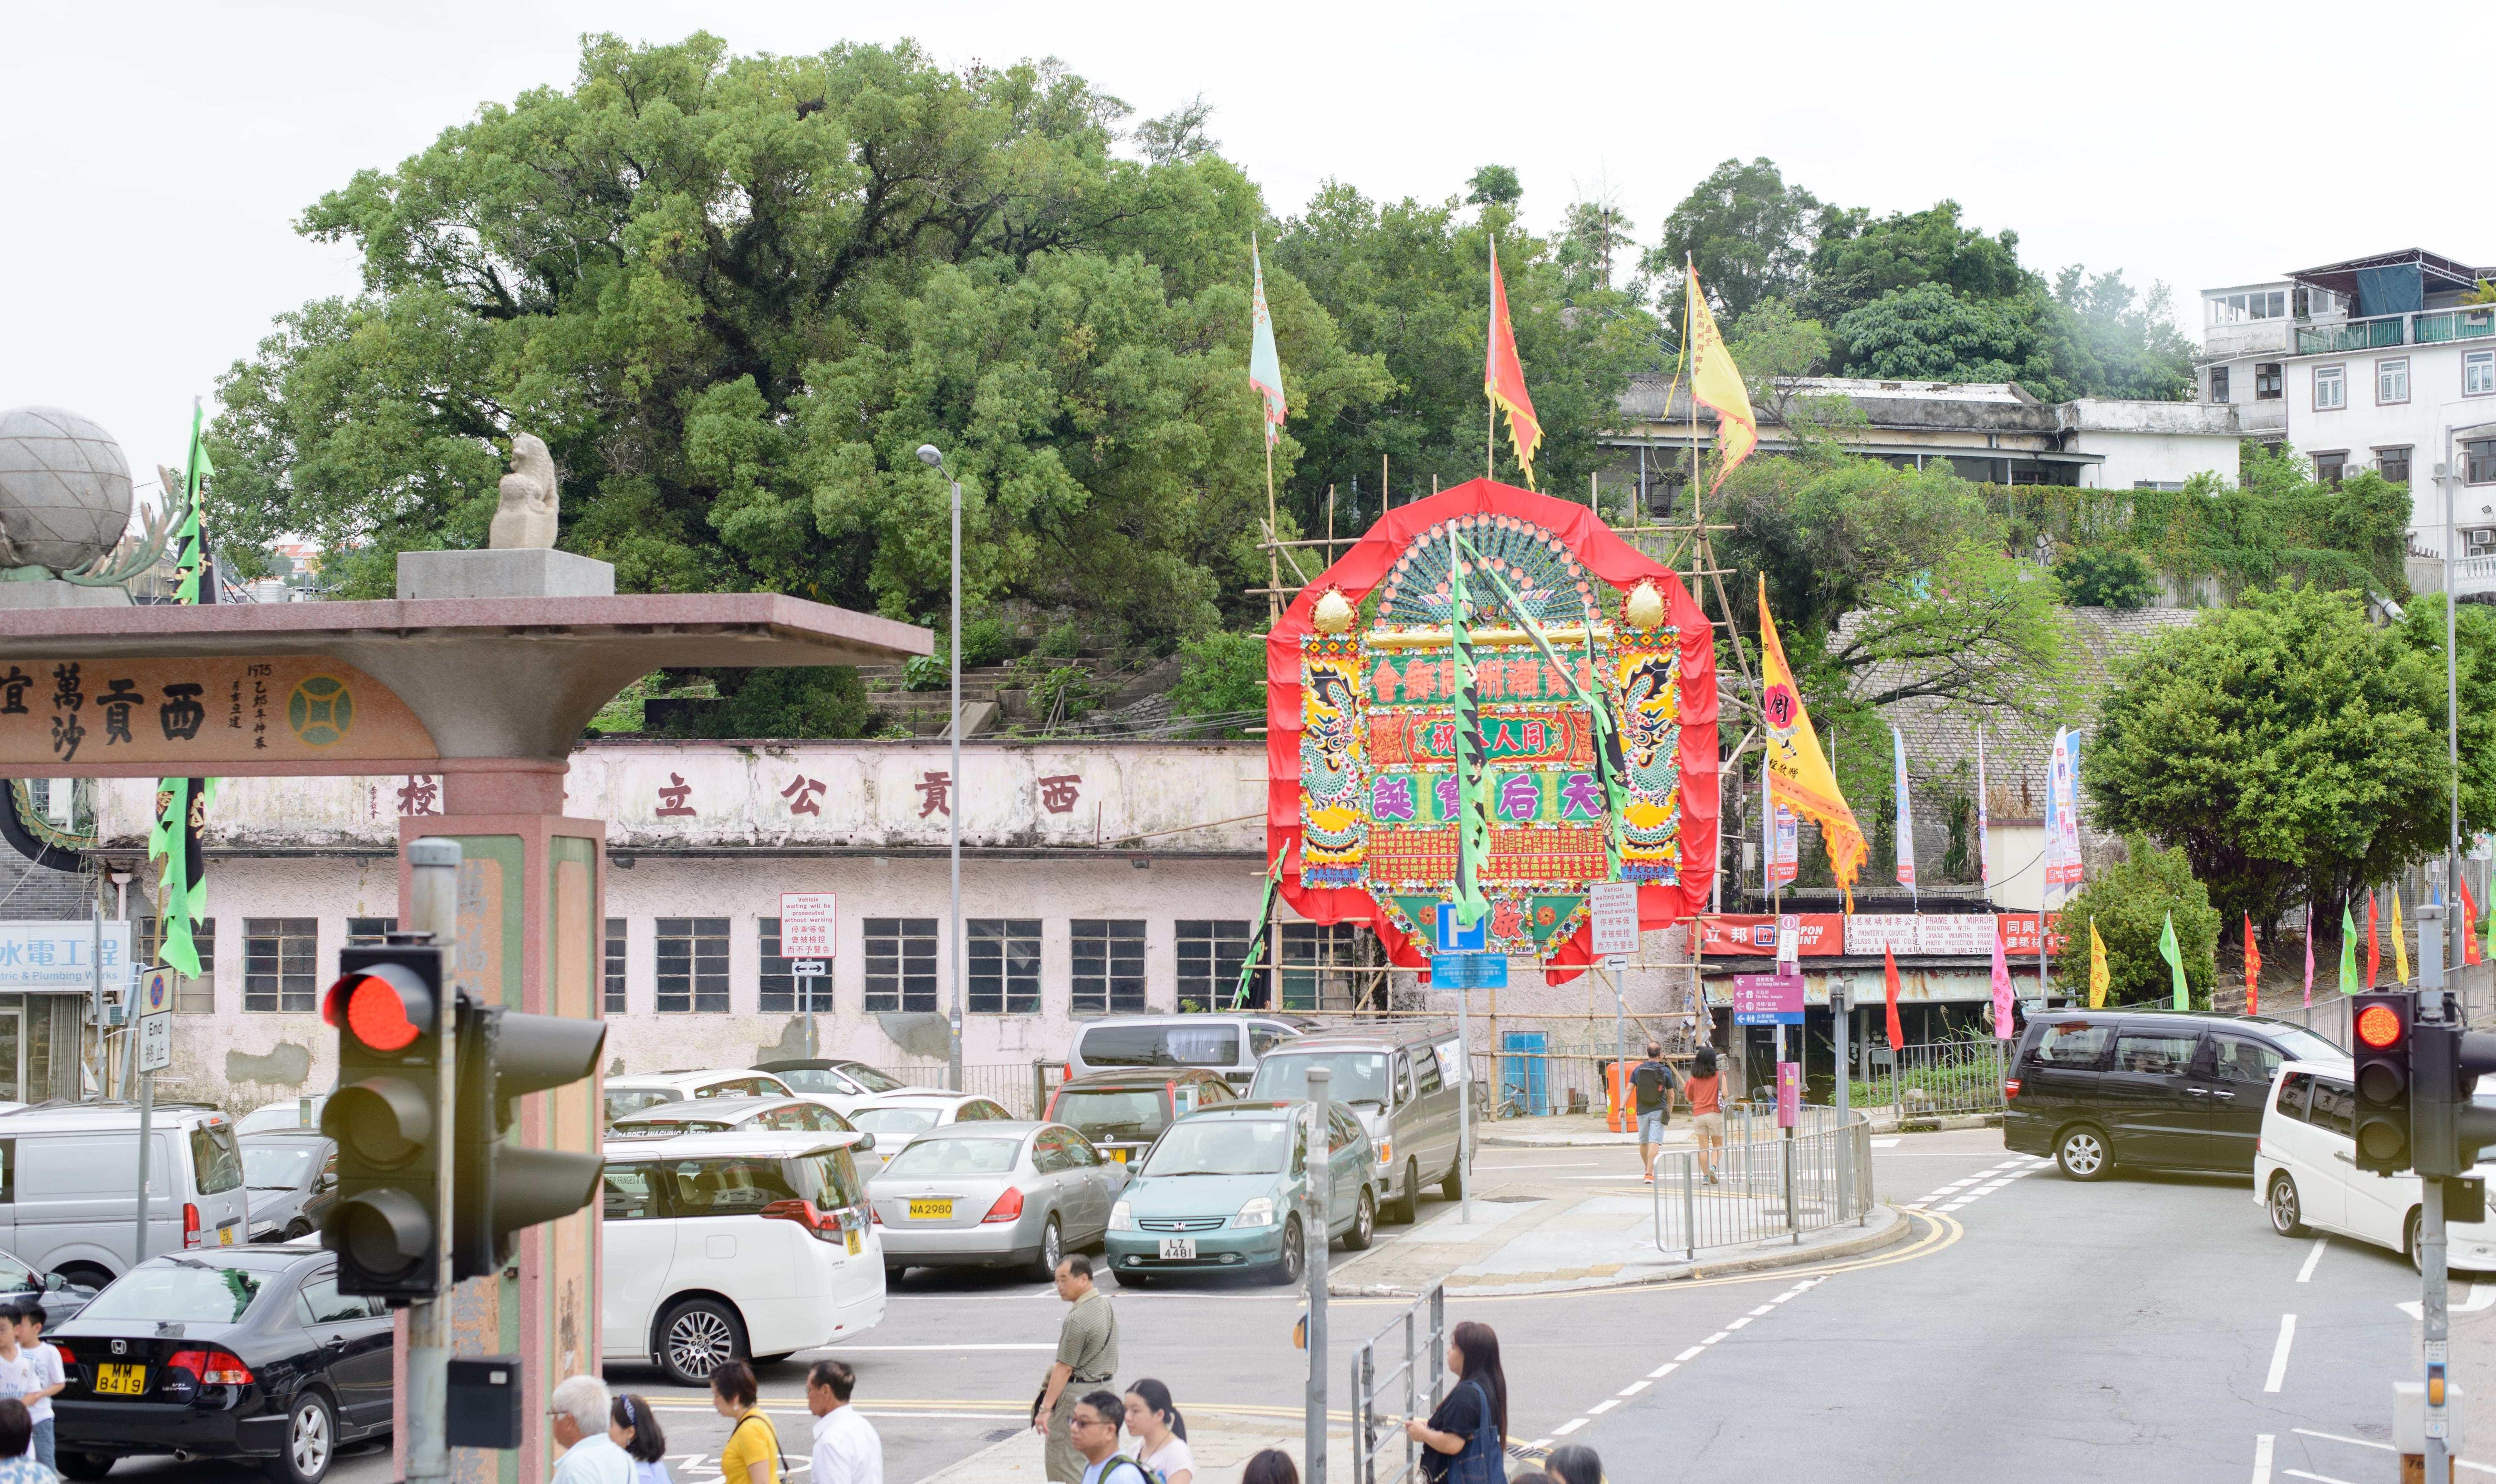 The old Sai Kung Public School next to Tin Hau Temple